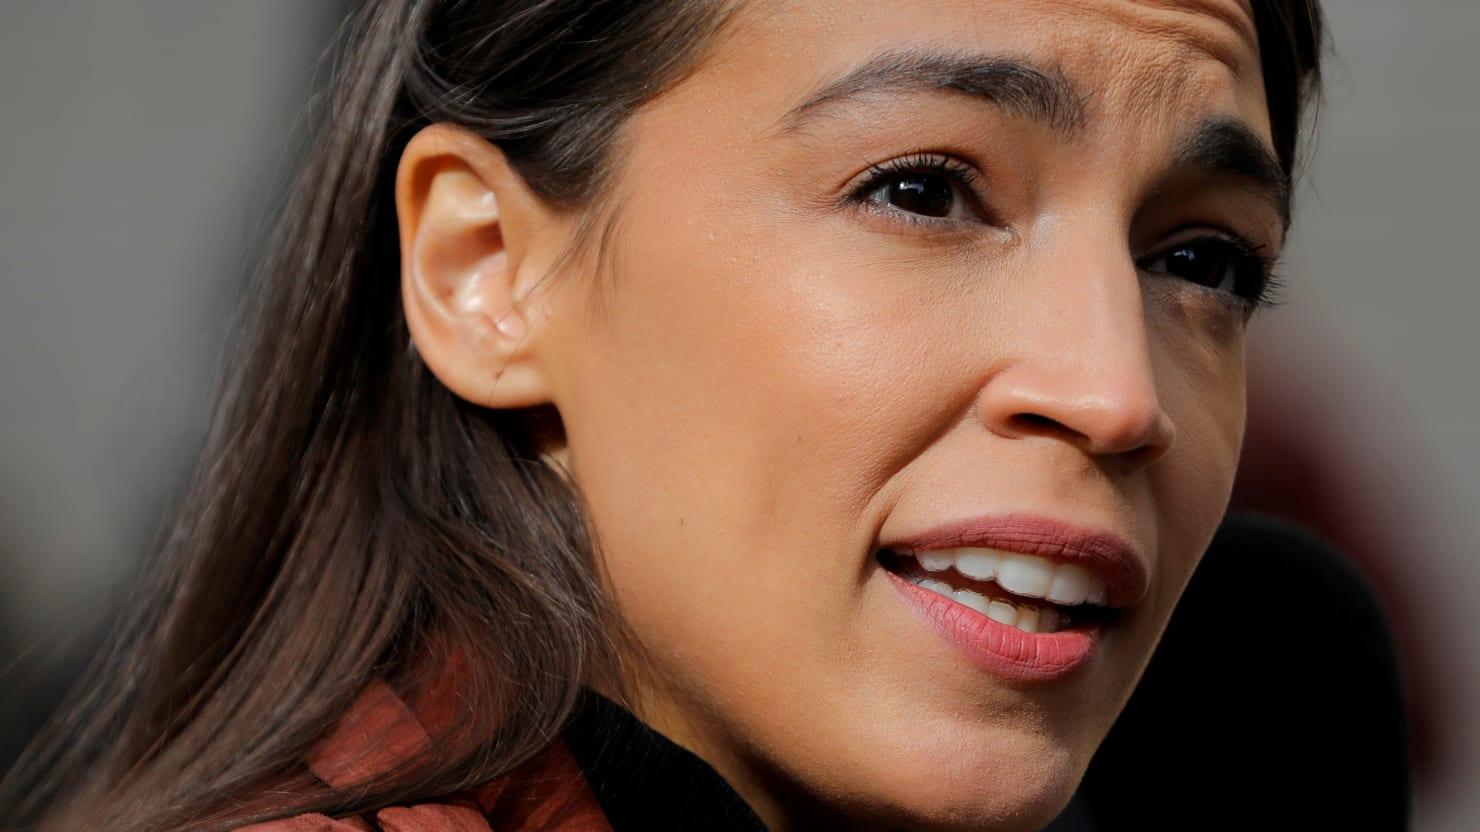 Alexandria Ocasio-Cortez Demands Independent Investigation Into Cuomo Sexual Misconduct Claims